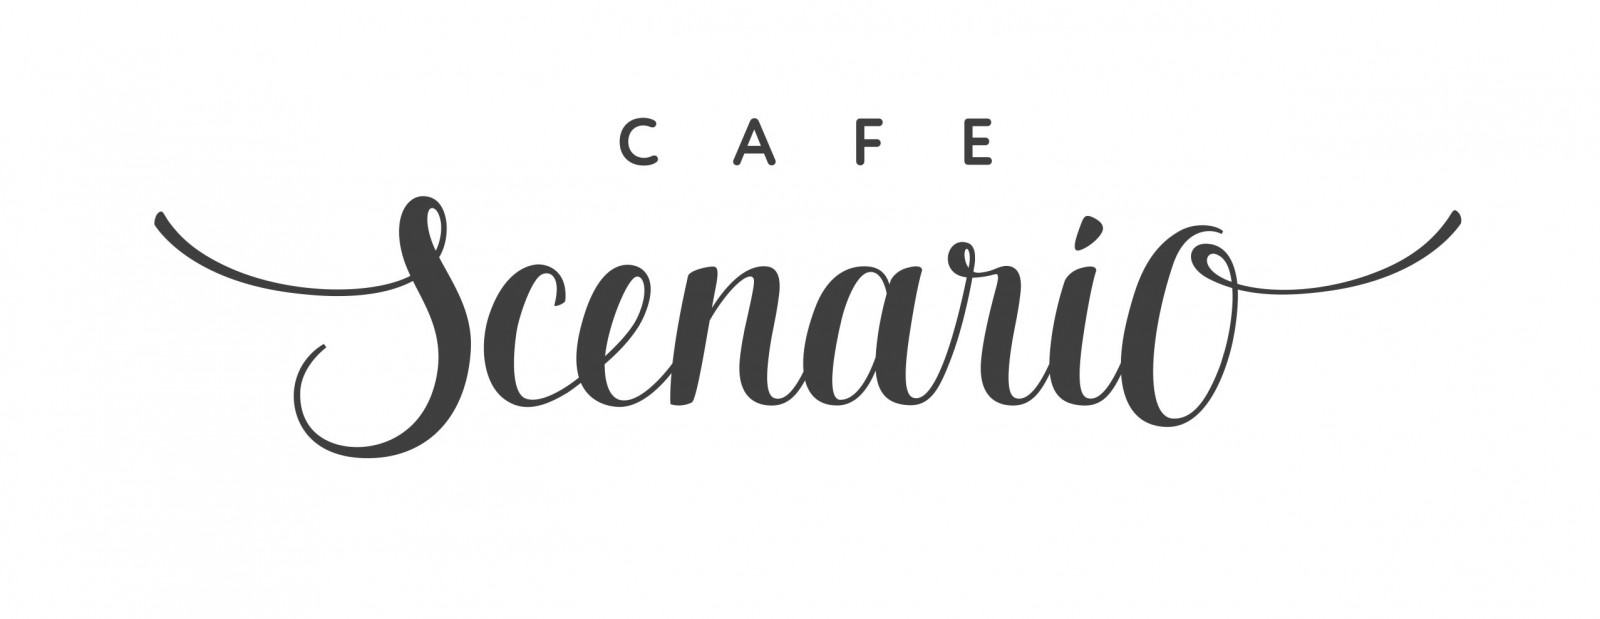 "Кафе ""Сценарио"""